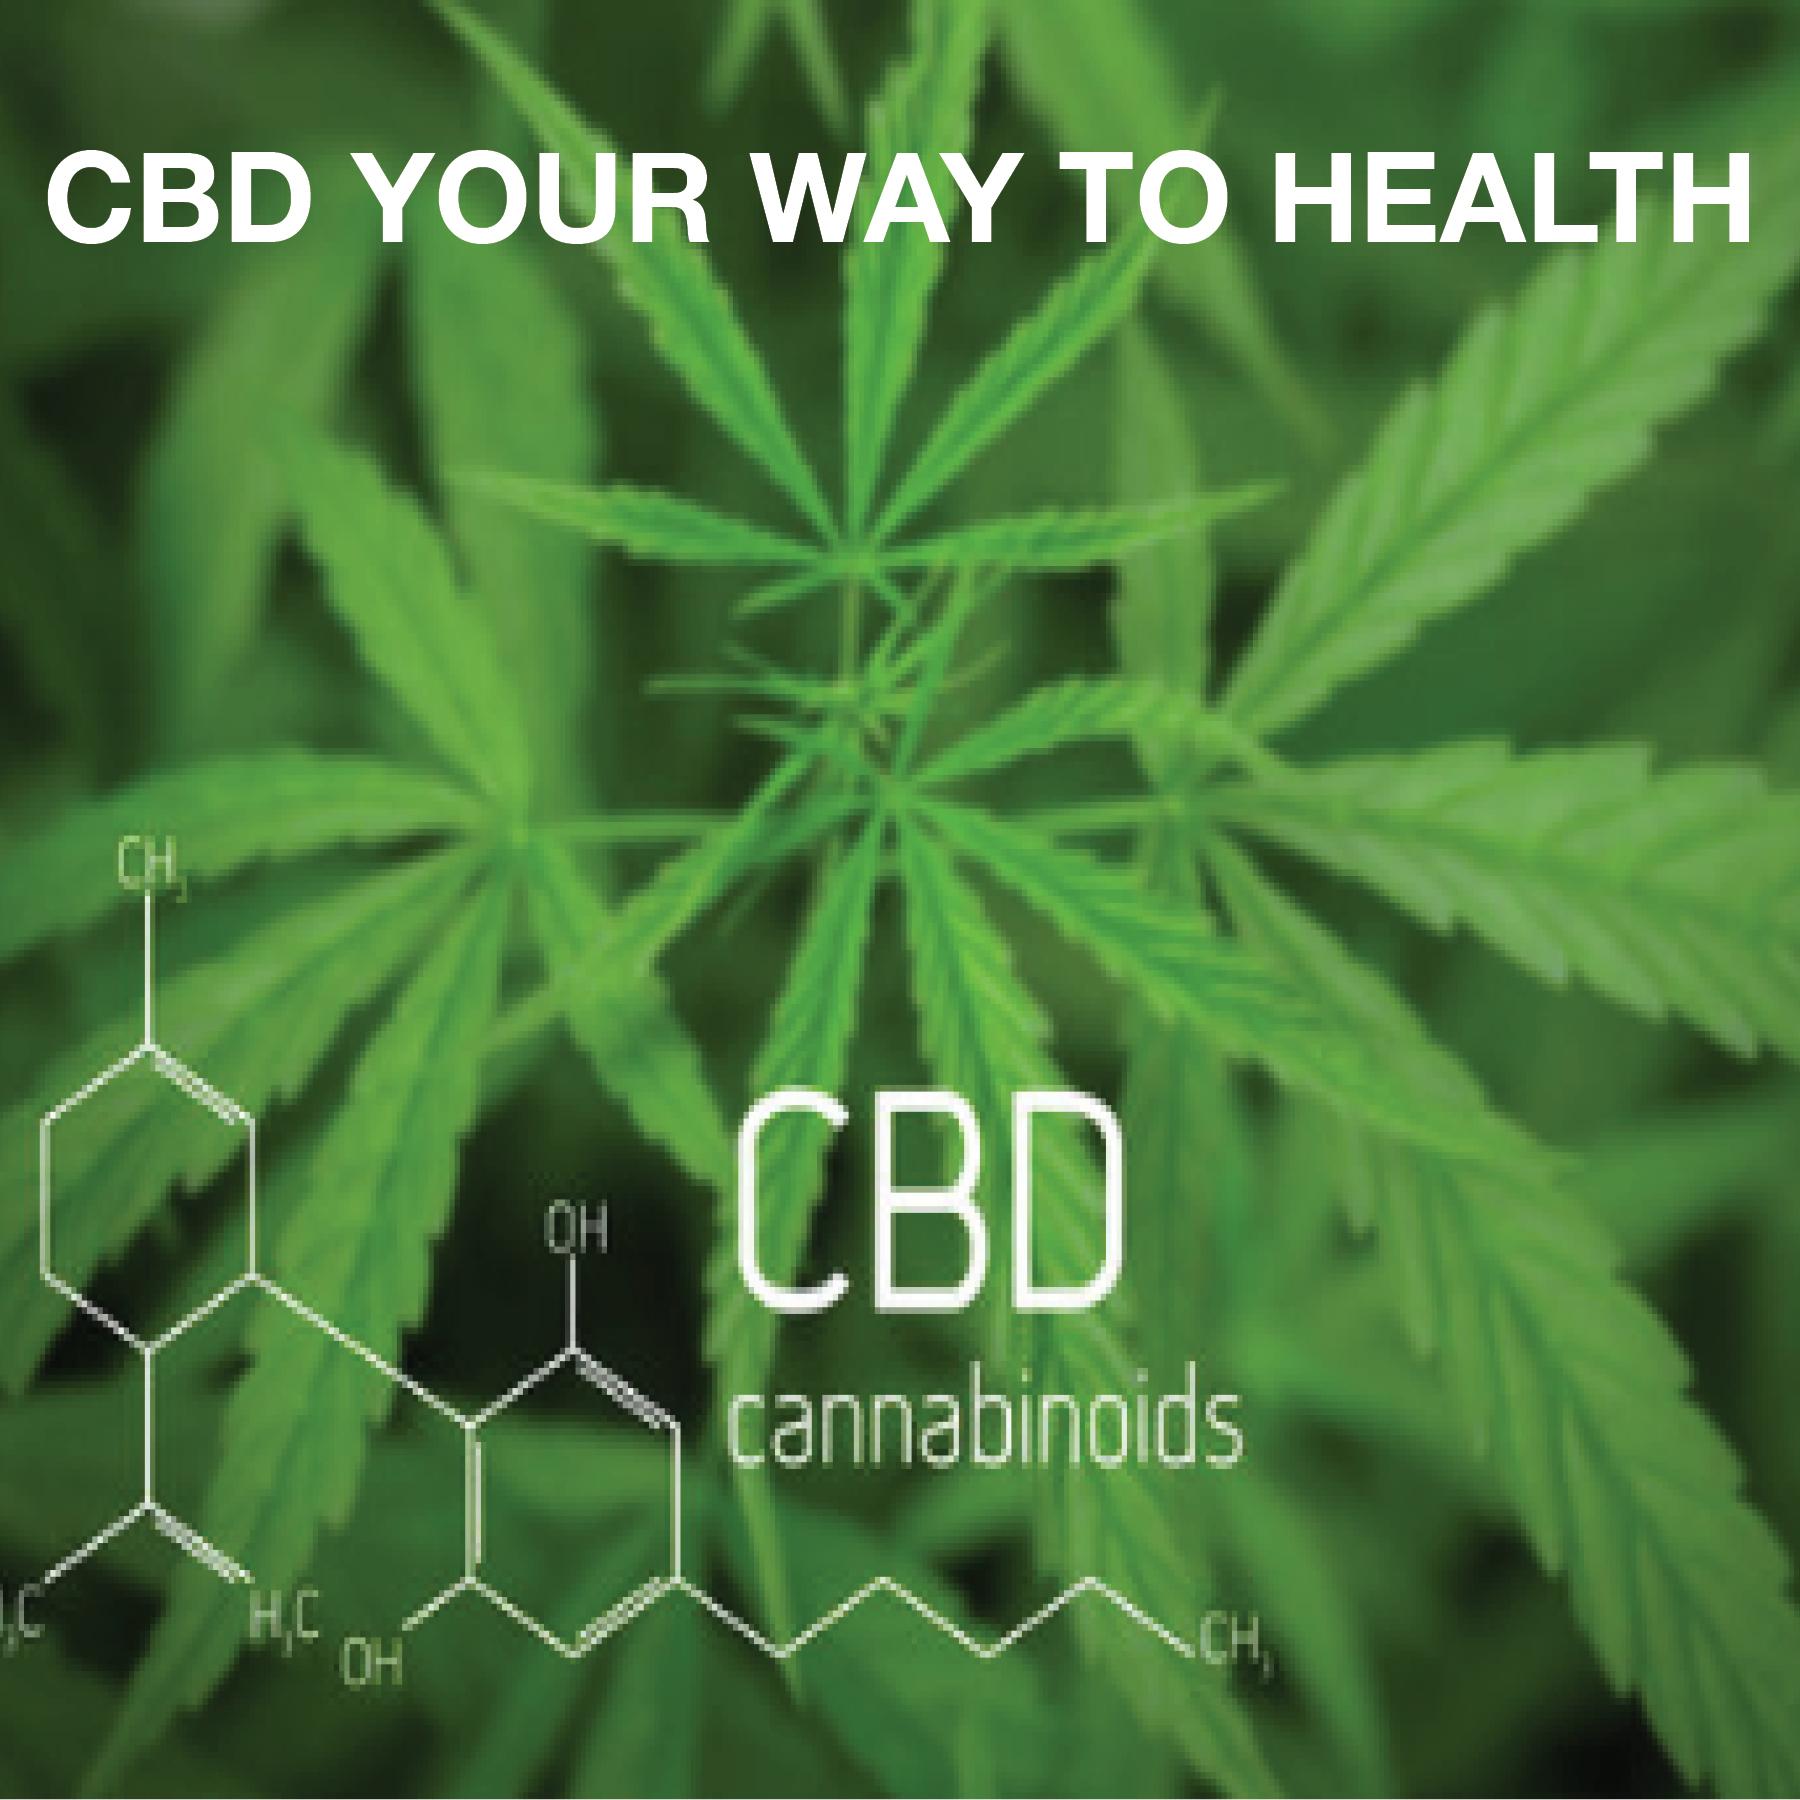 CBD Your Way To Health Home Page.jpg